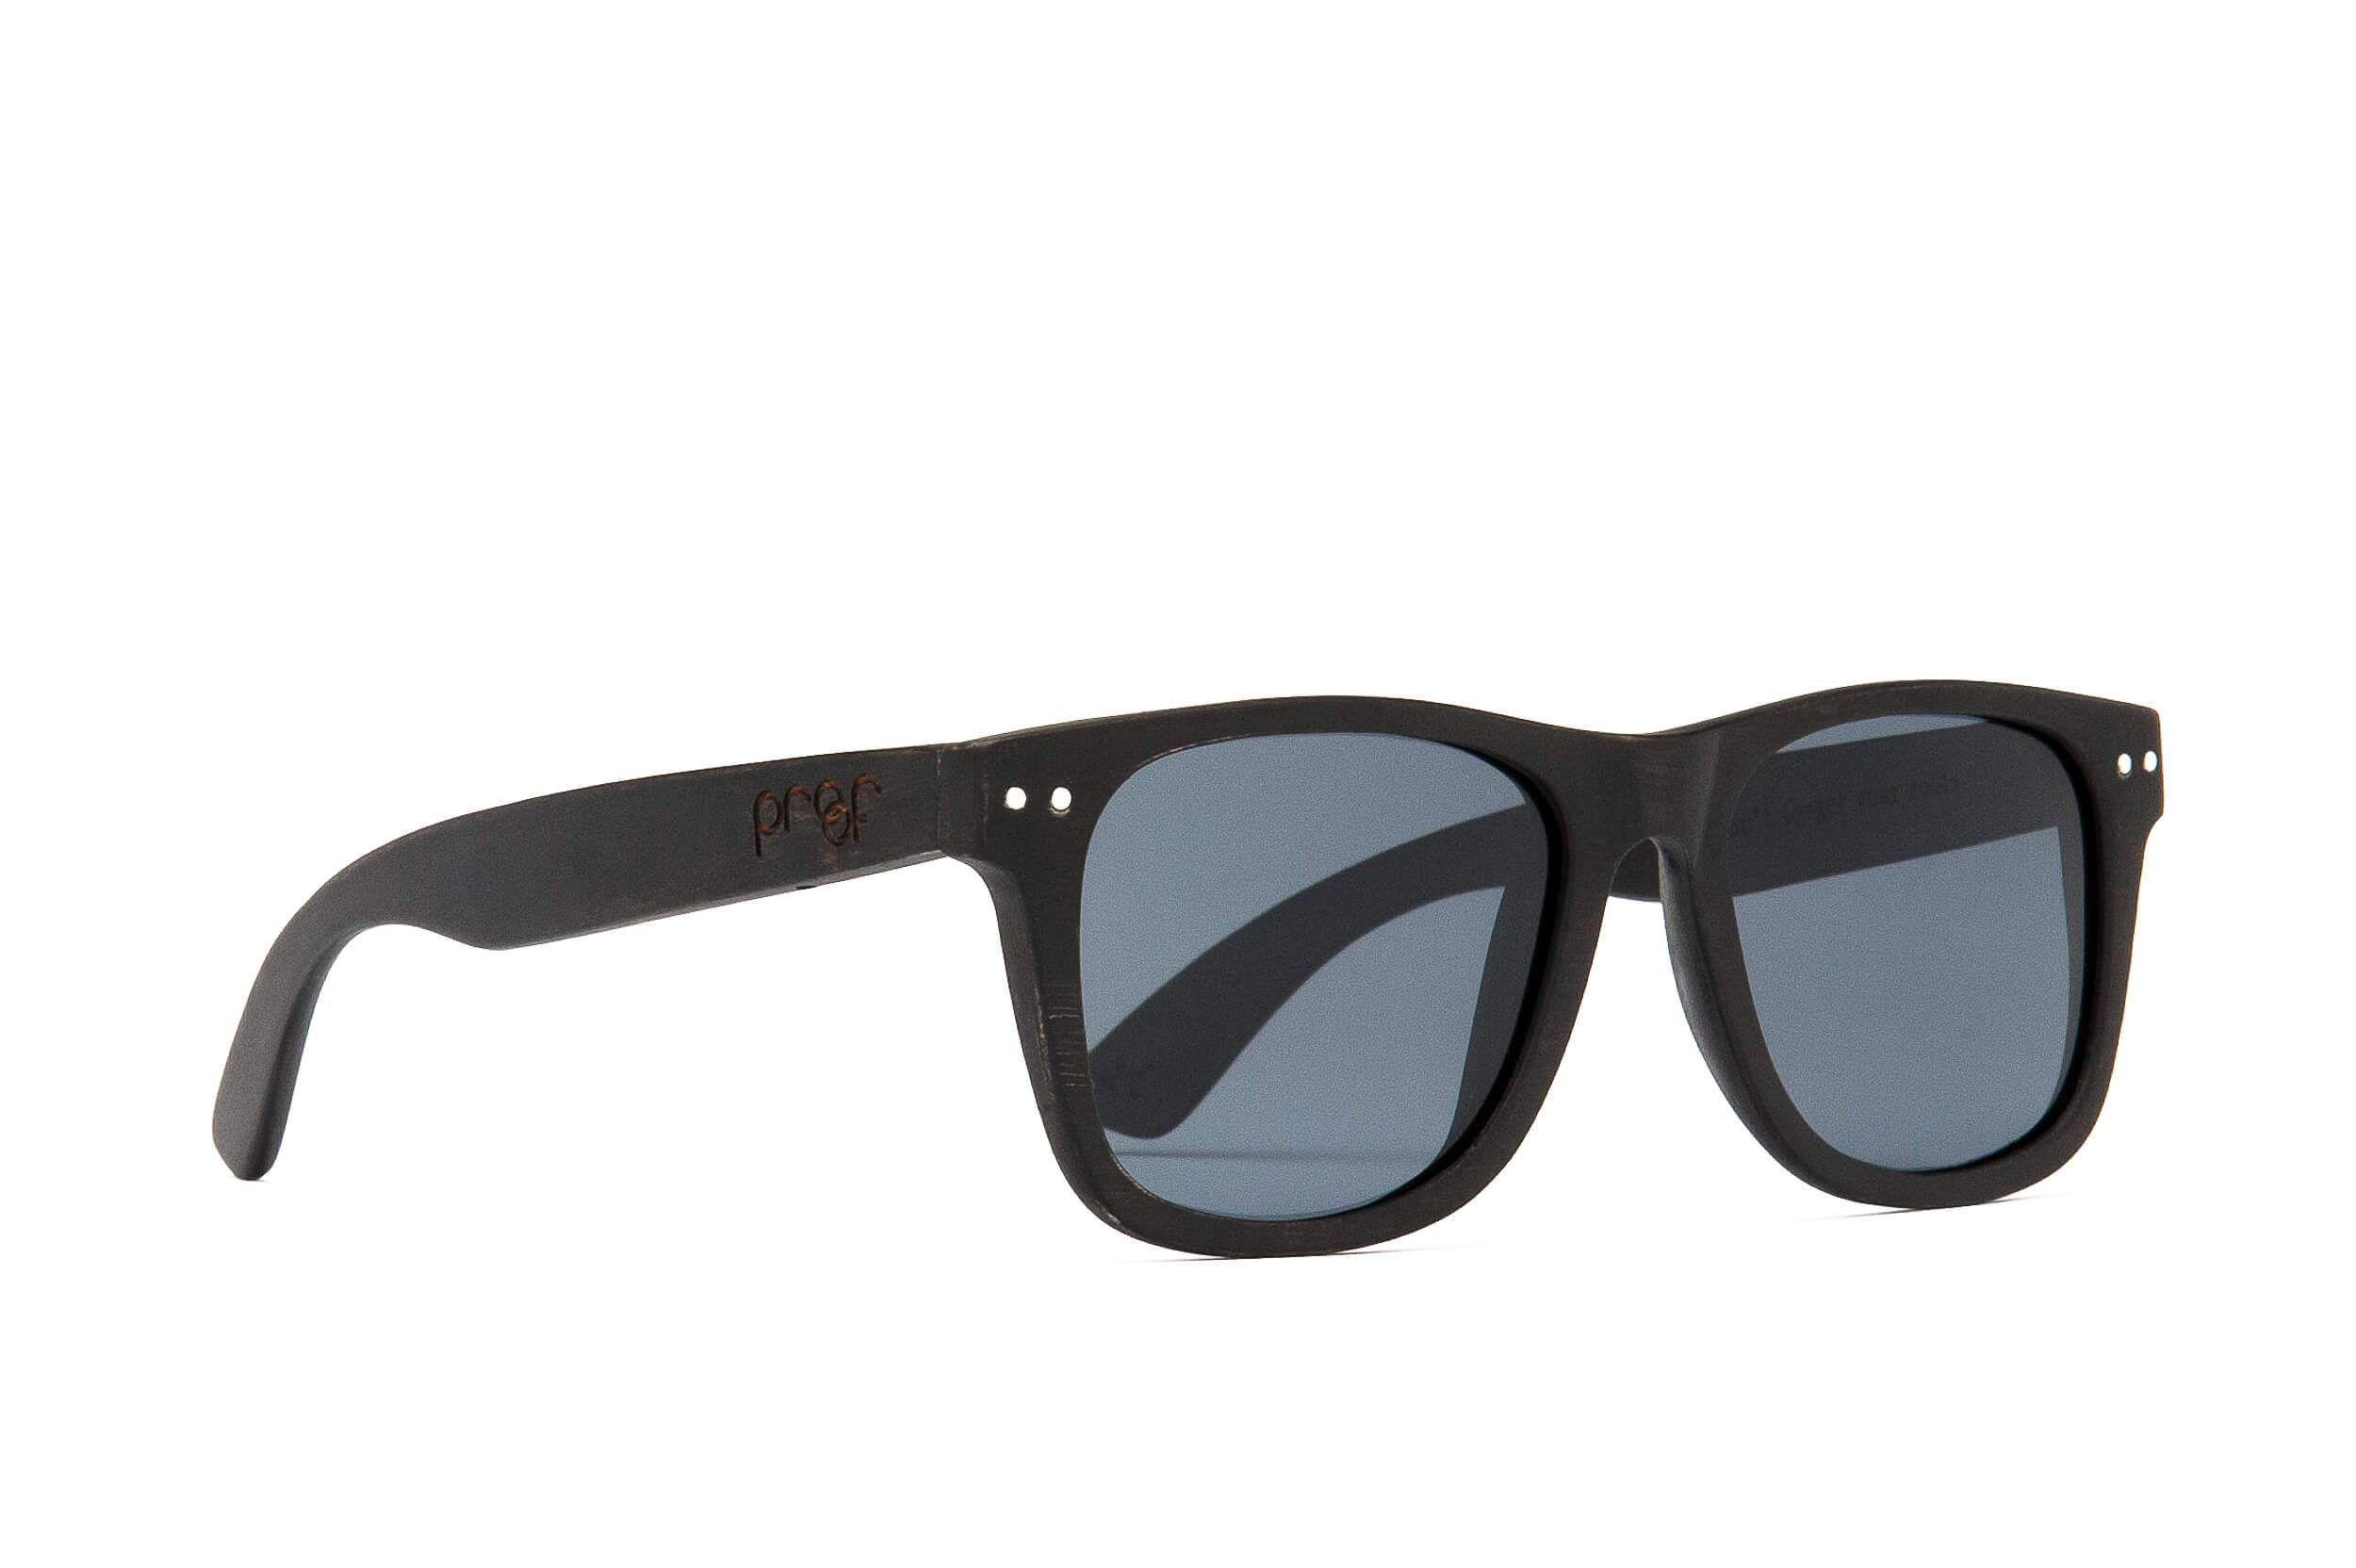 d48726449c13 Ontario Wood Sunglasses – Proof Eyewear